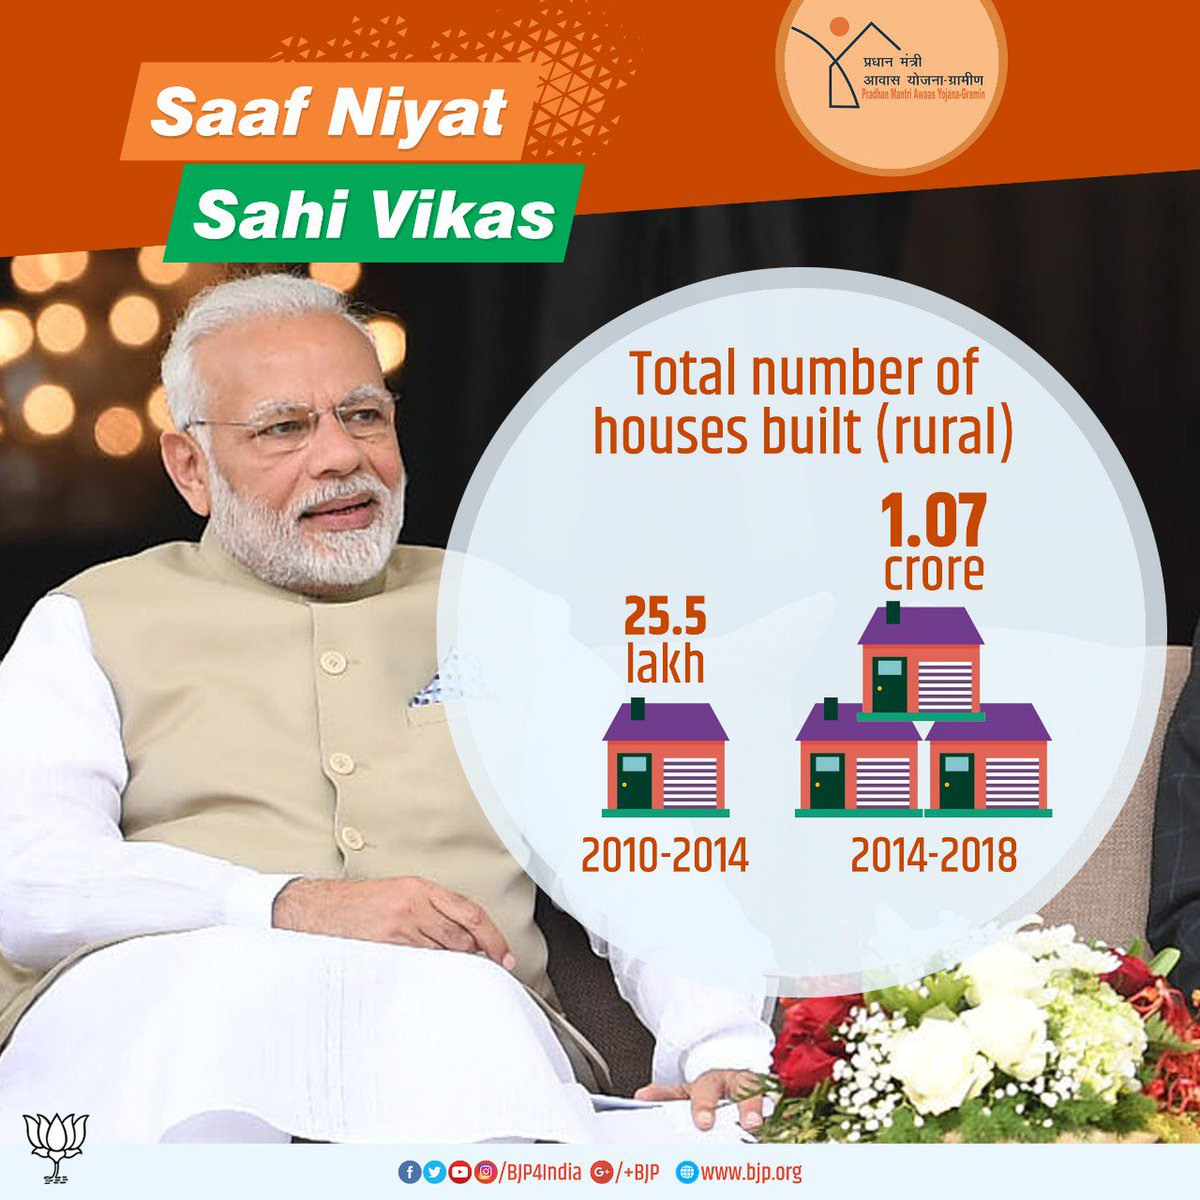 Modi government built 1.07 crore houses under Pradhan Mantri Awas Yojana (Gramin) during 2014-18. #SaafNiyatSahiVikas